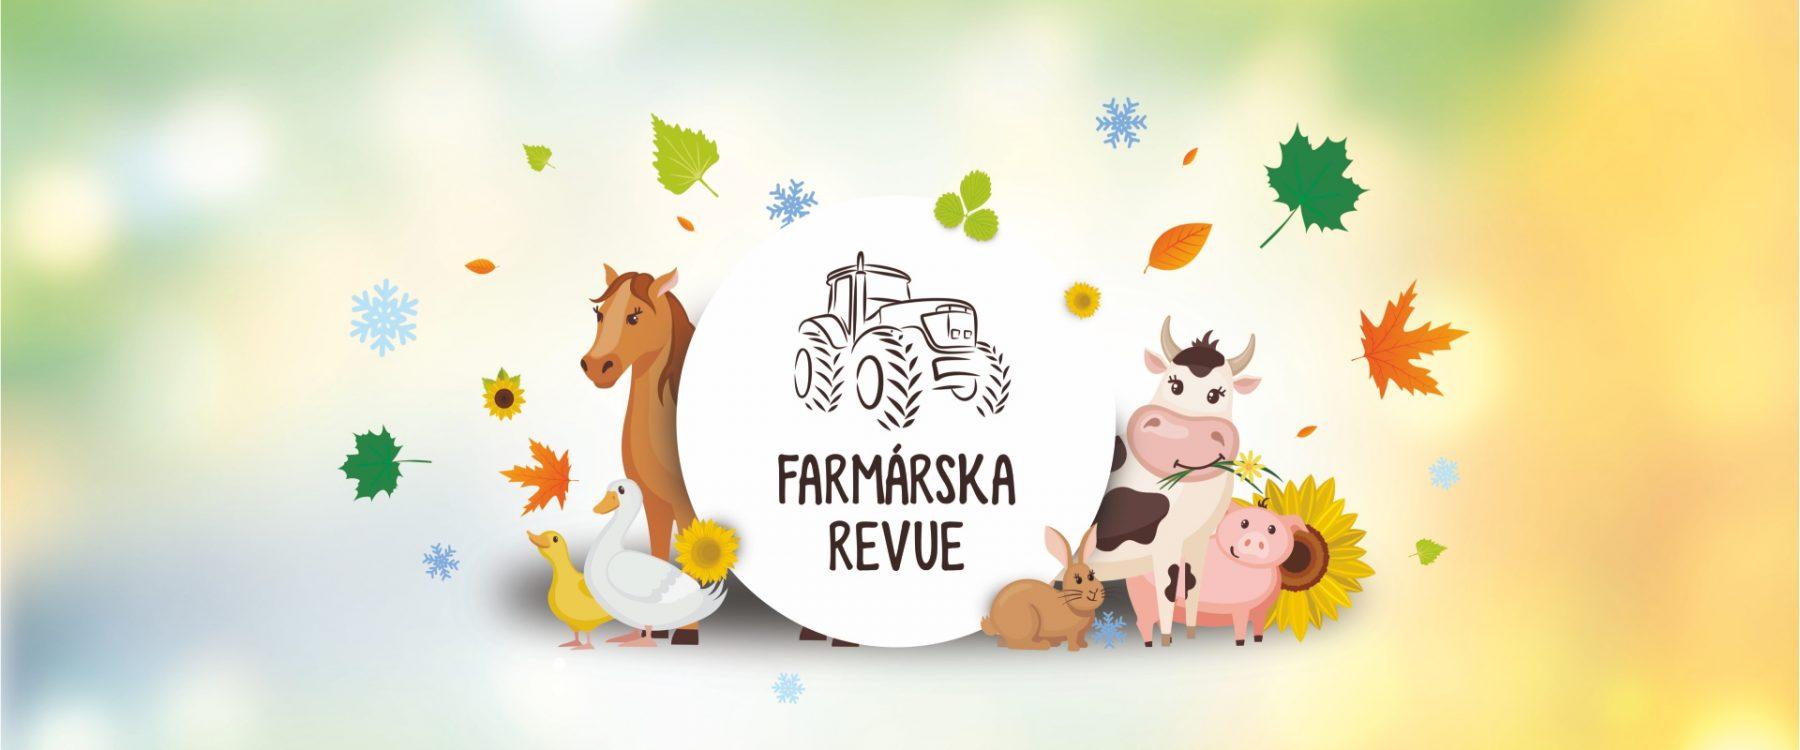 hra Farmárska revue